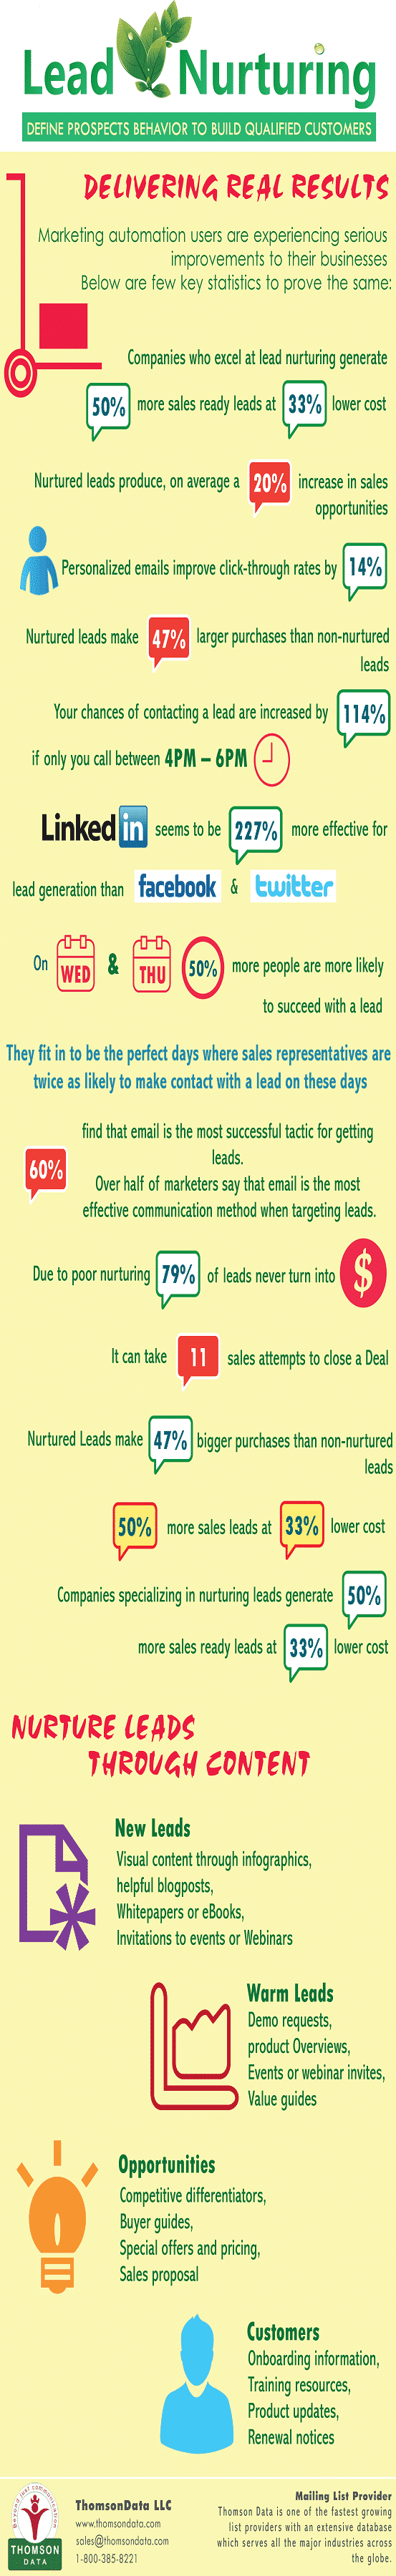 Lead Nurturing – Define Prospects Behavior to Build Qualified Customers [Infographic]